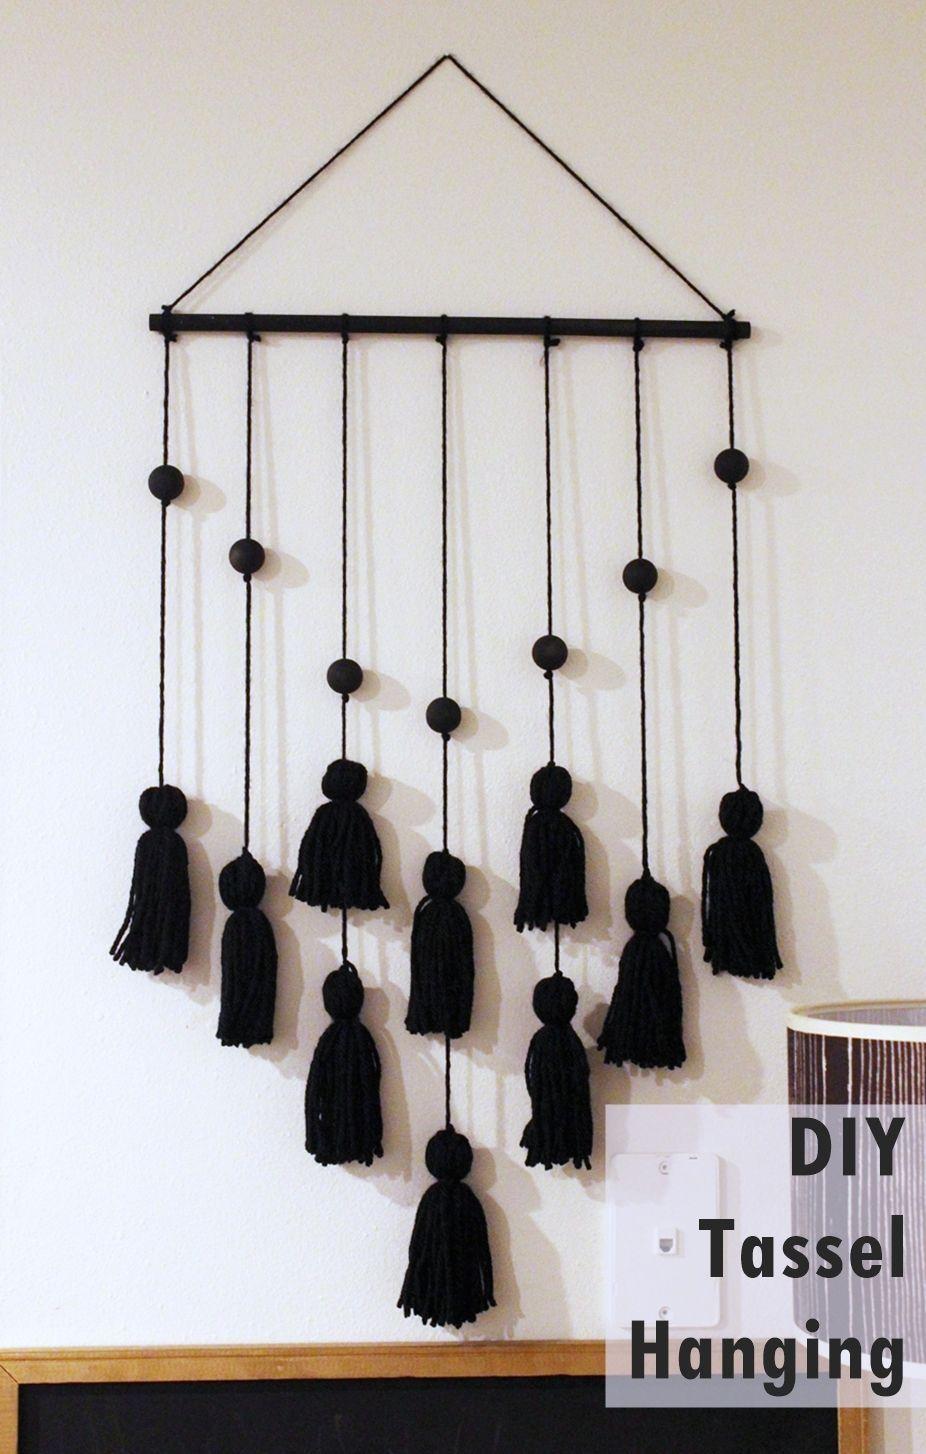 Tassel Hanging DIY Project